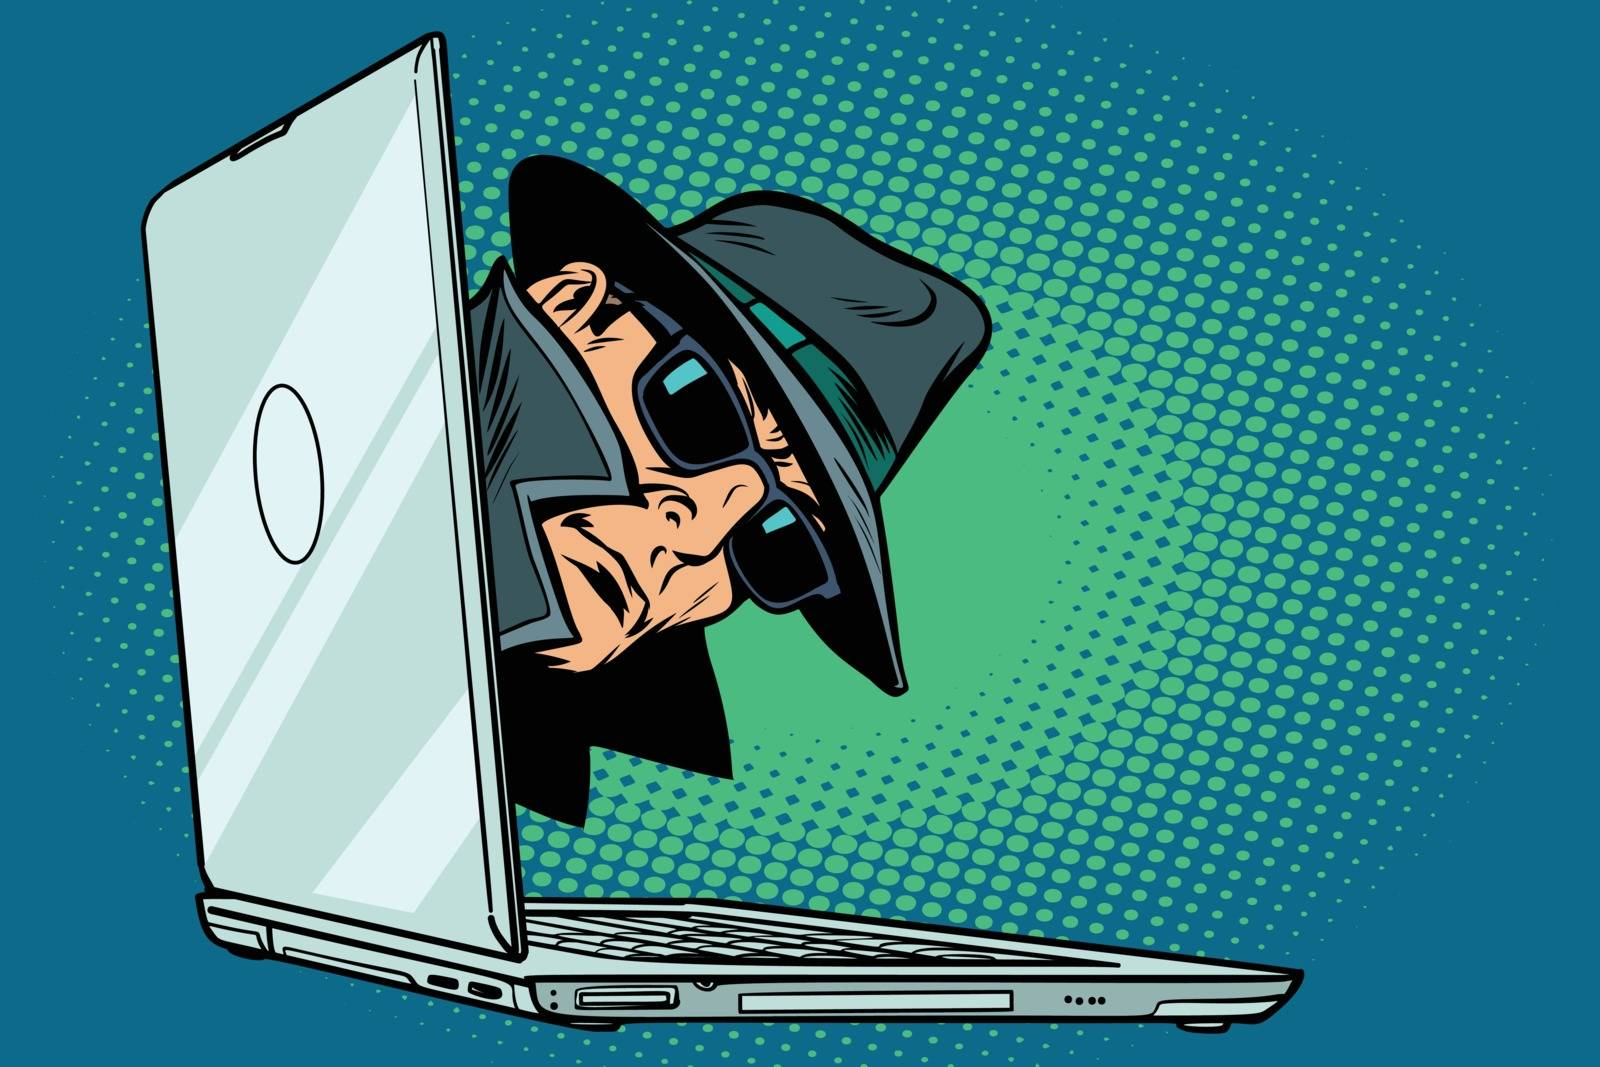 spy. laptop computer. surveillance and hacking. Comic cartoon pop art retro vector illustration